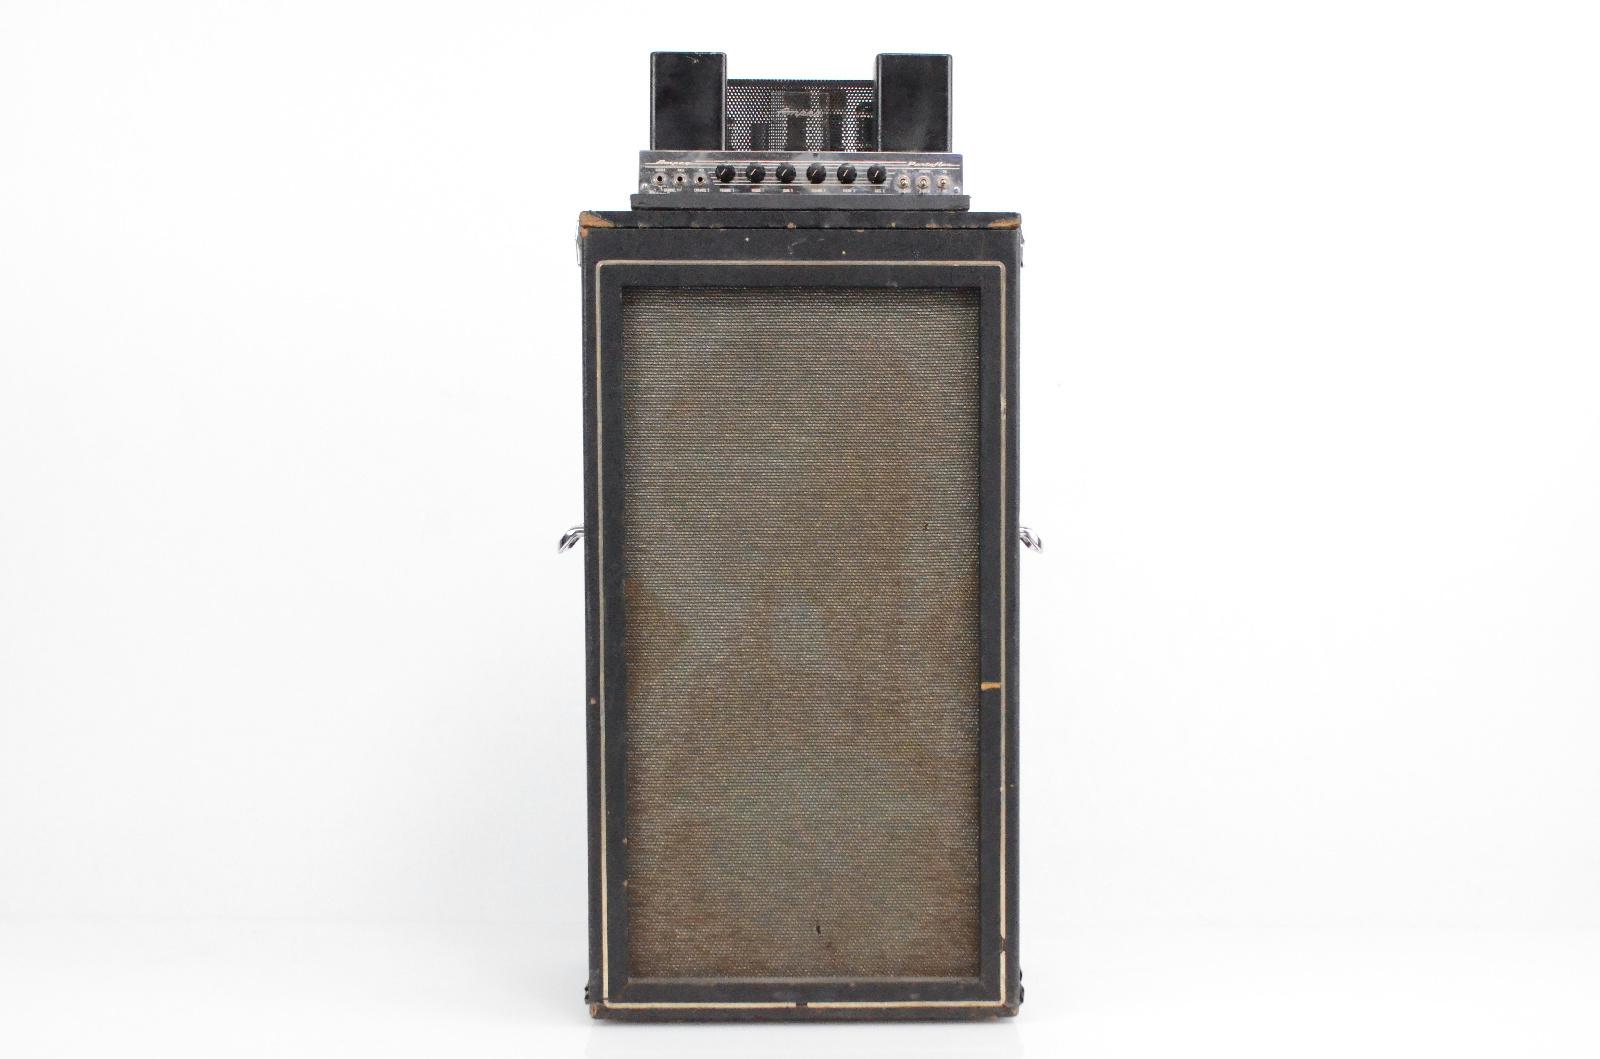 1967 Ampeg B-15 Bass Amp Head w/ B-15C 2x15 Speaker Cab & Road Case #32239